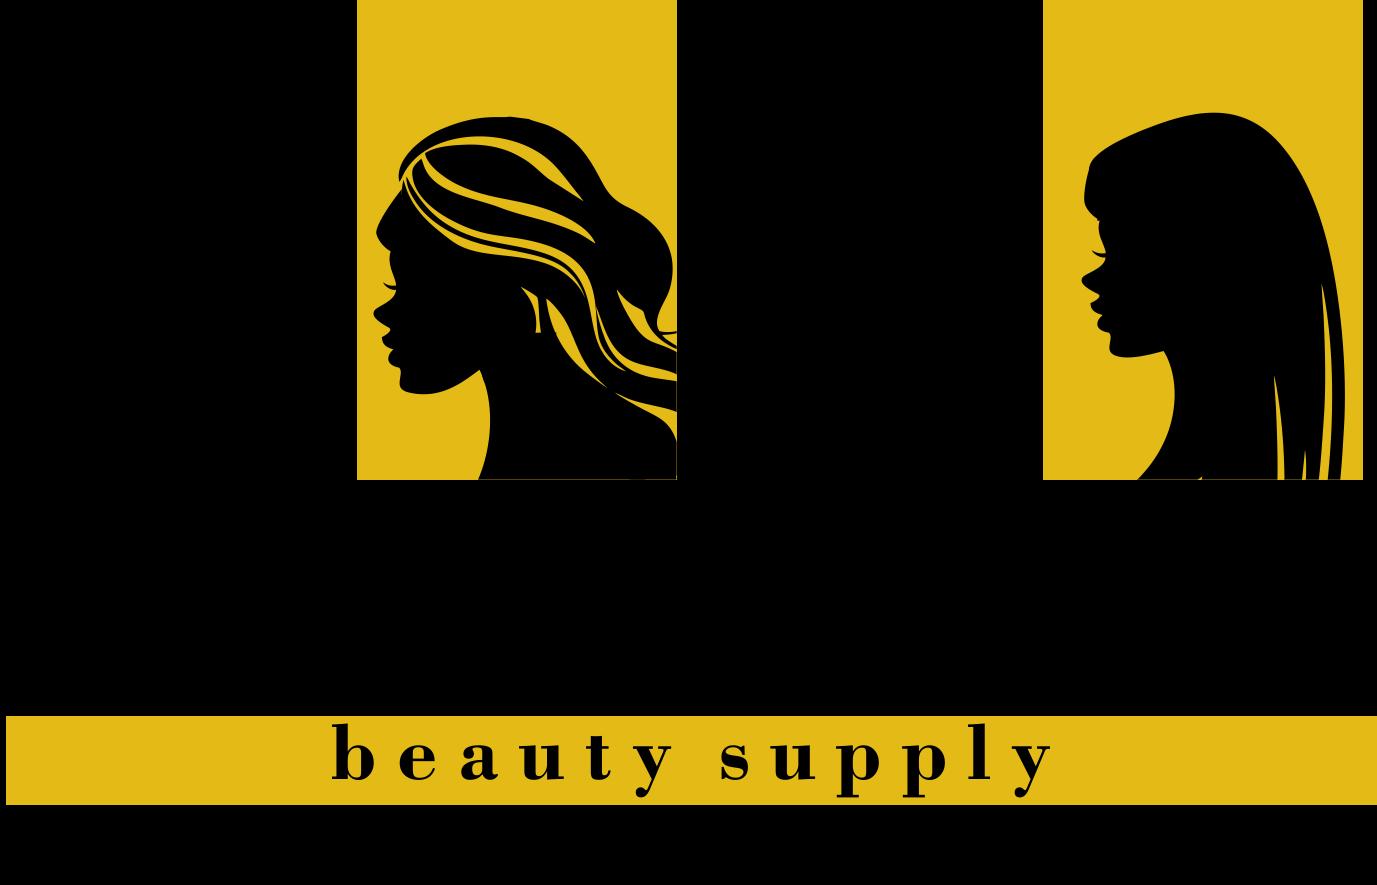 Ms. Melanin Beauty Supply & Salon